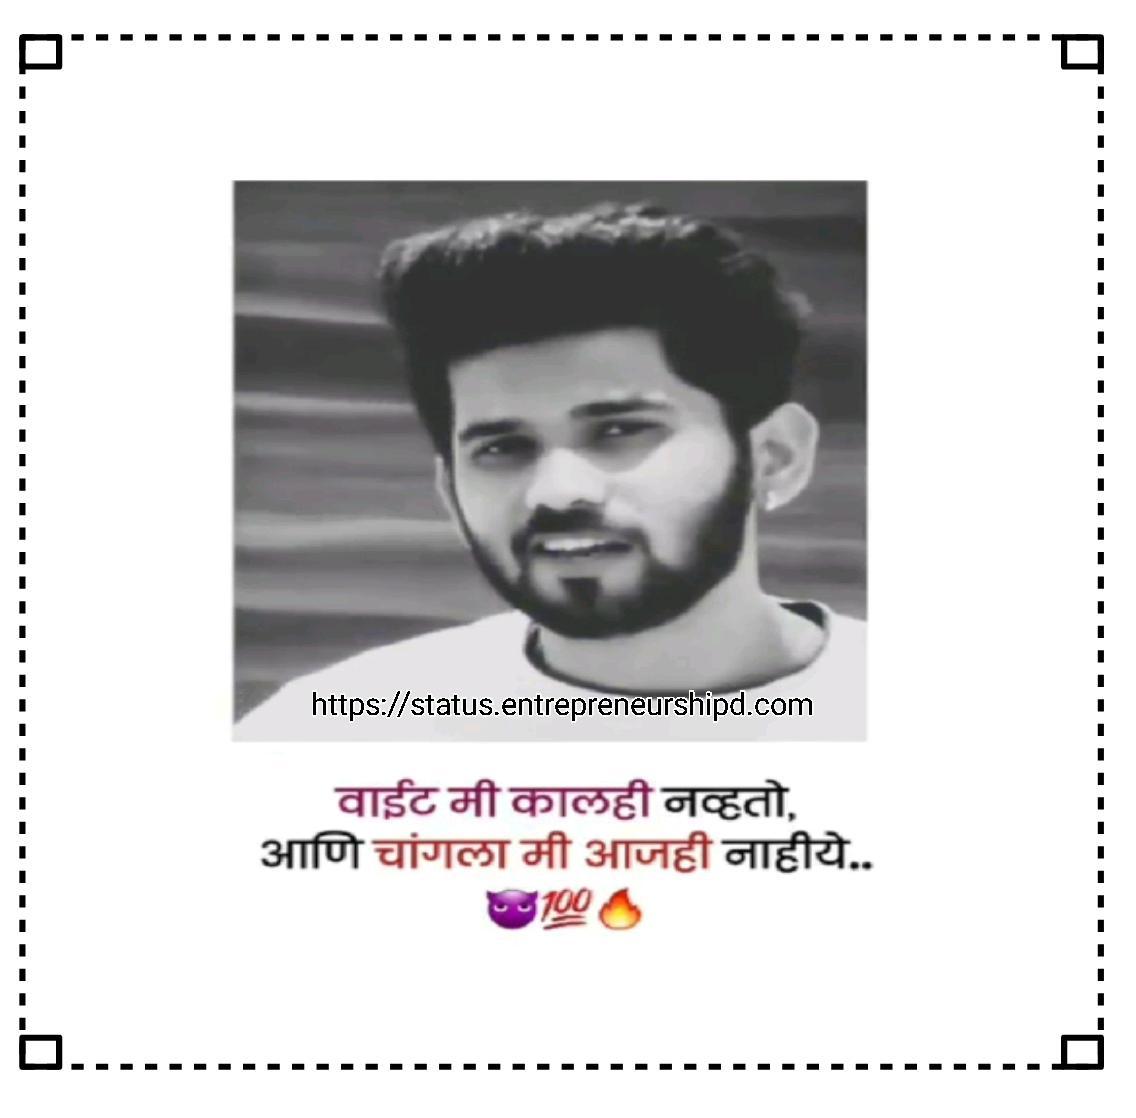 Royal karbhar marathi attitude status Khatarnak attitude status marathi